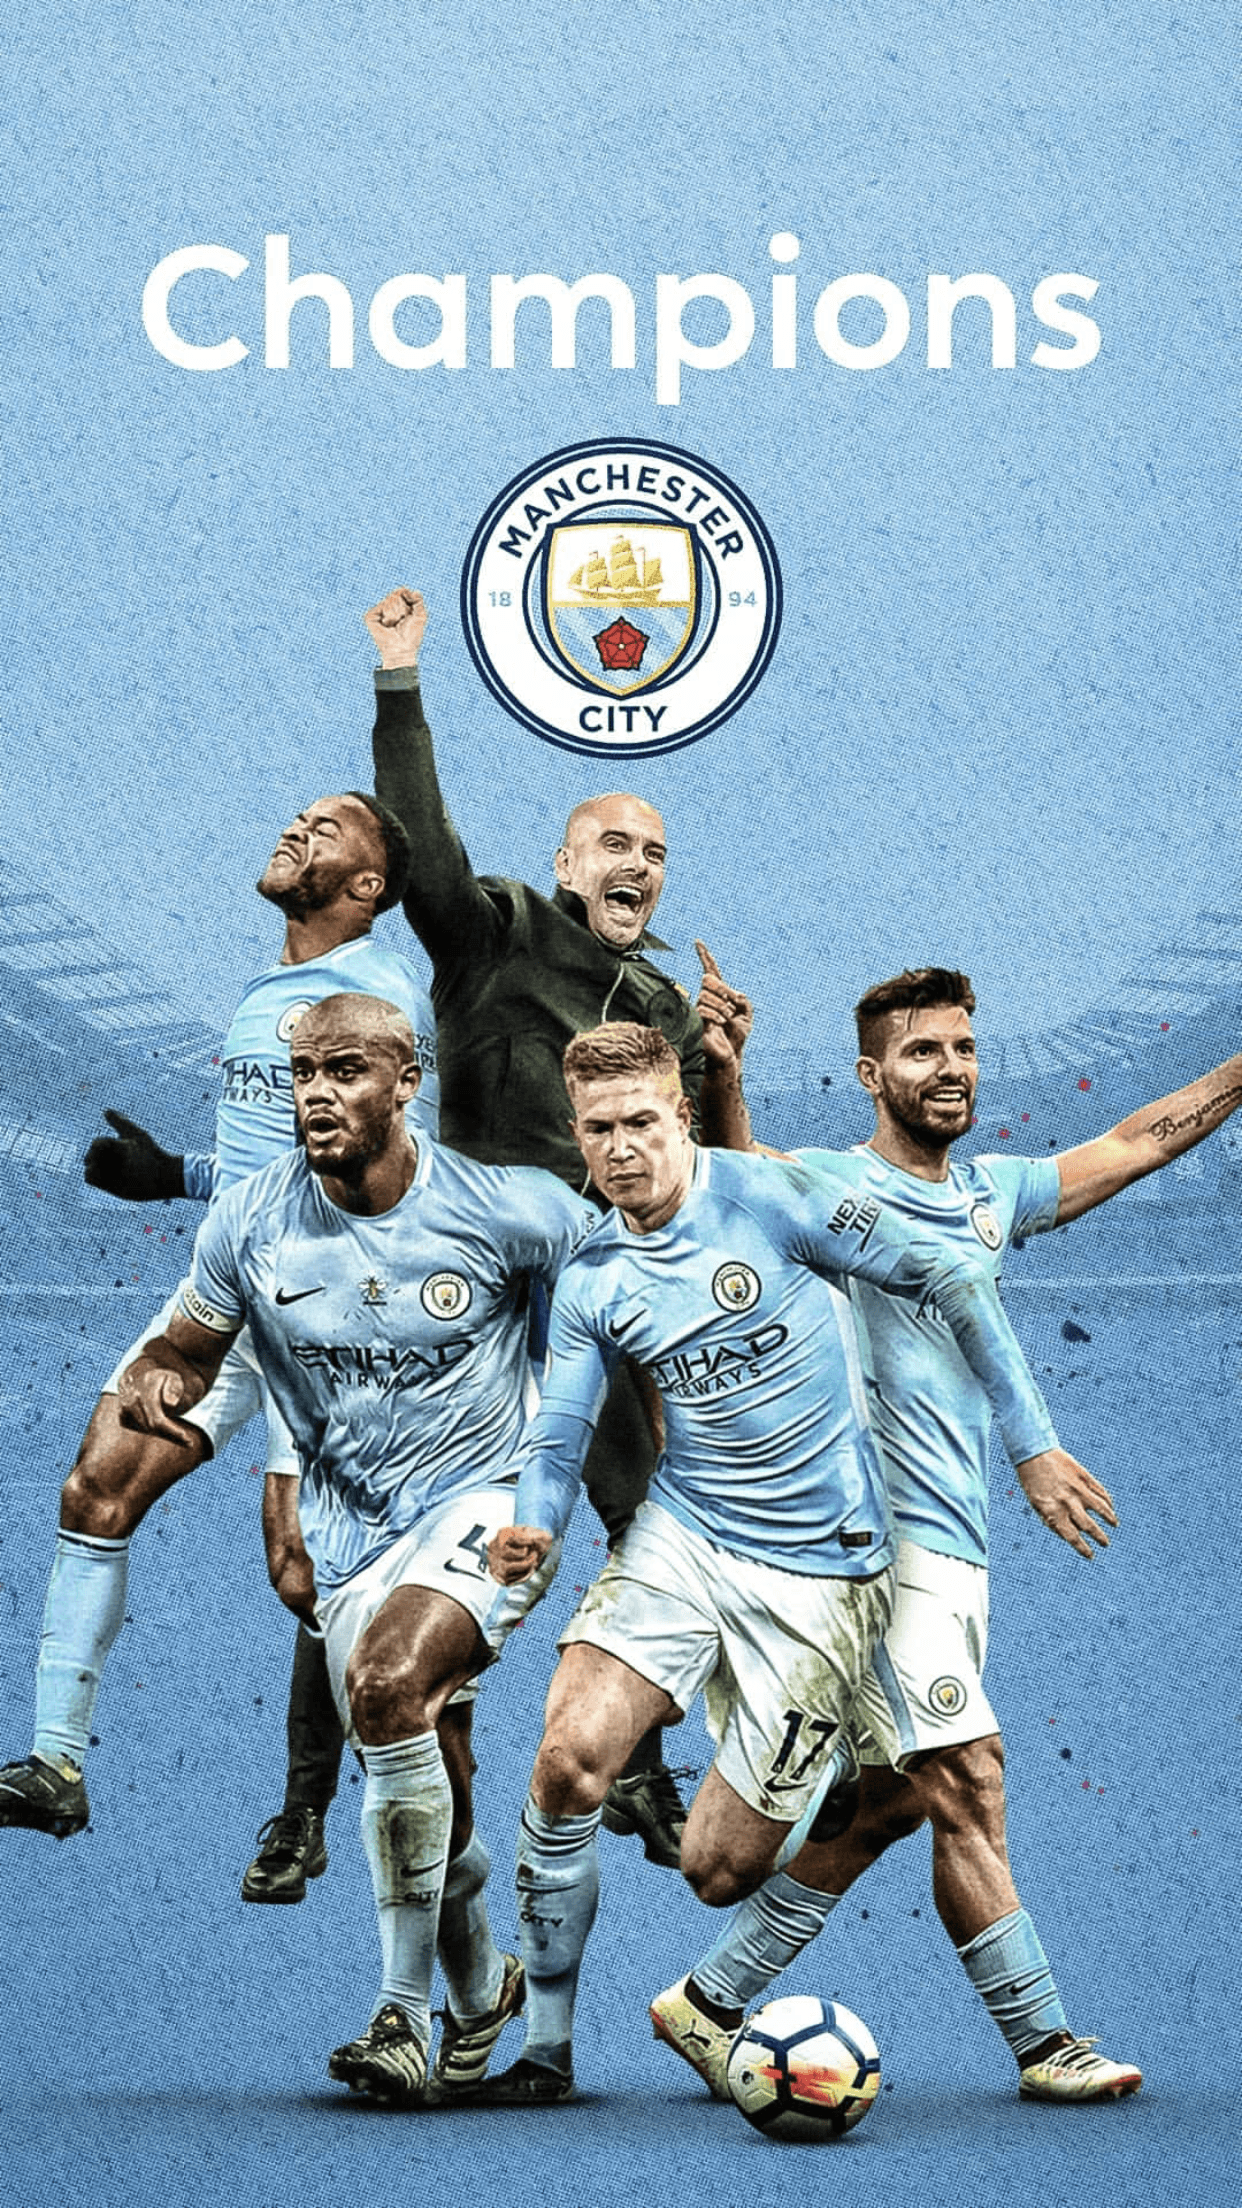 Man City Champions 2018 Wallpapers On Wallpaperdog